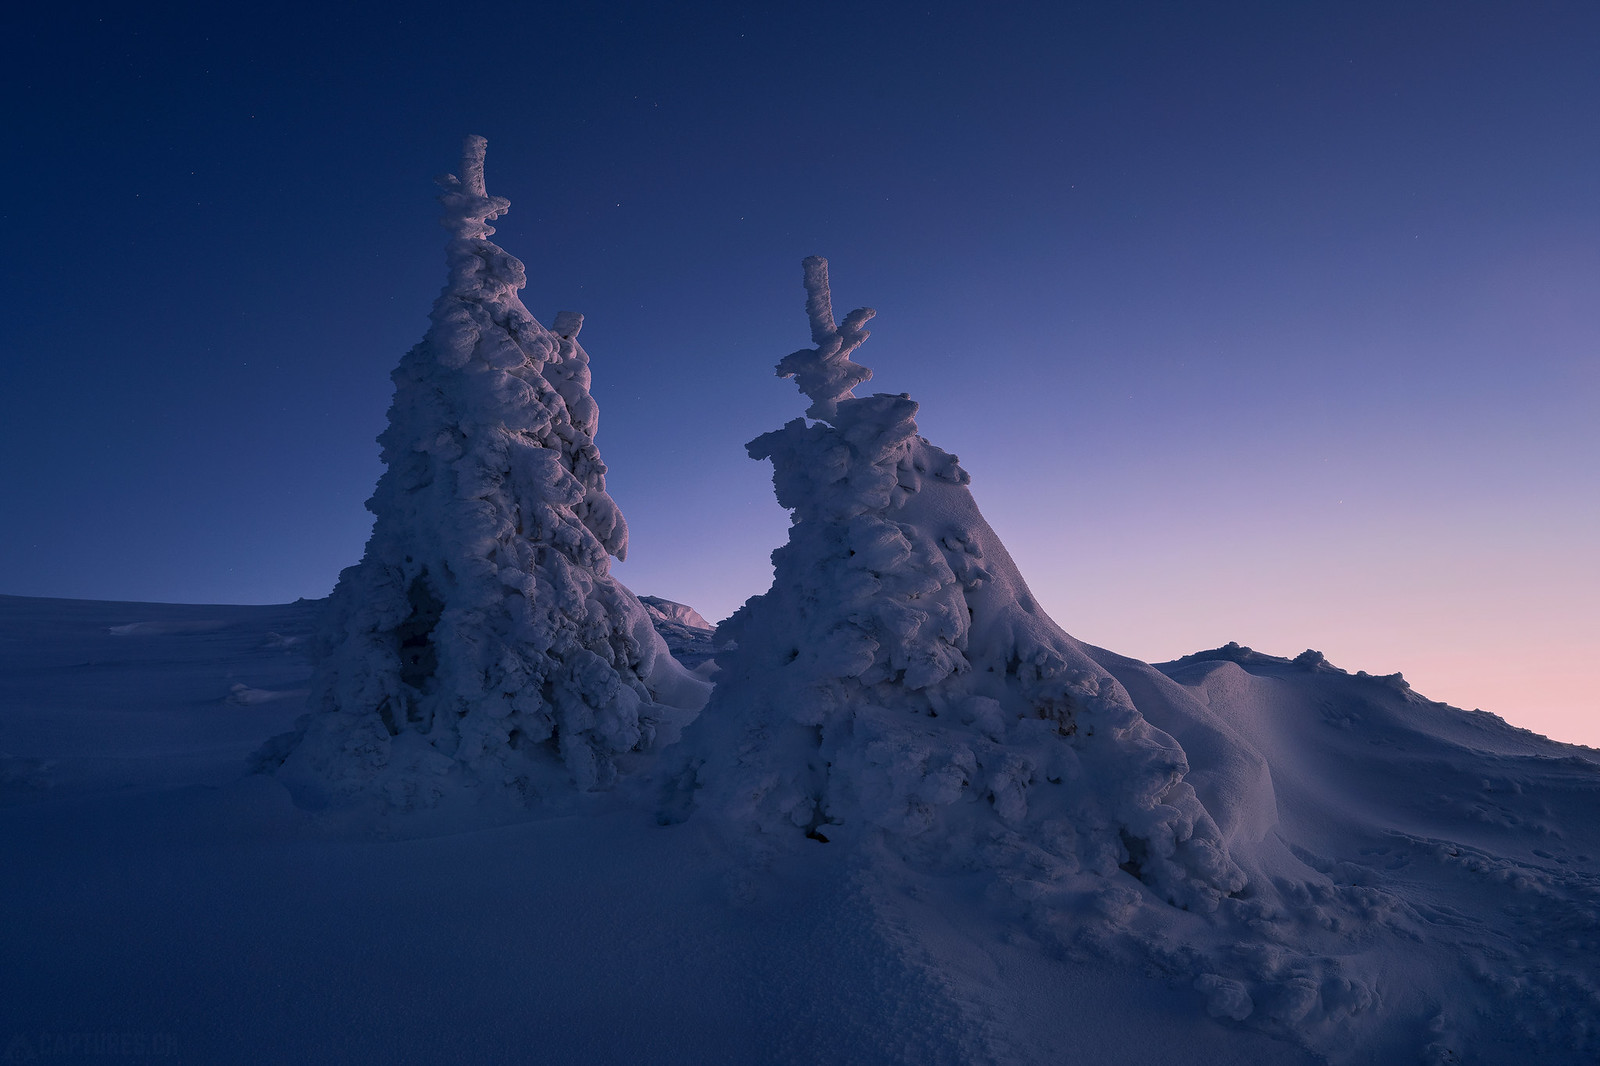 Frozen trees - Jura